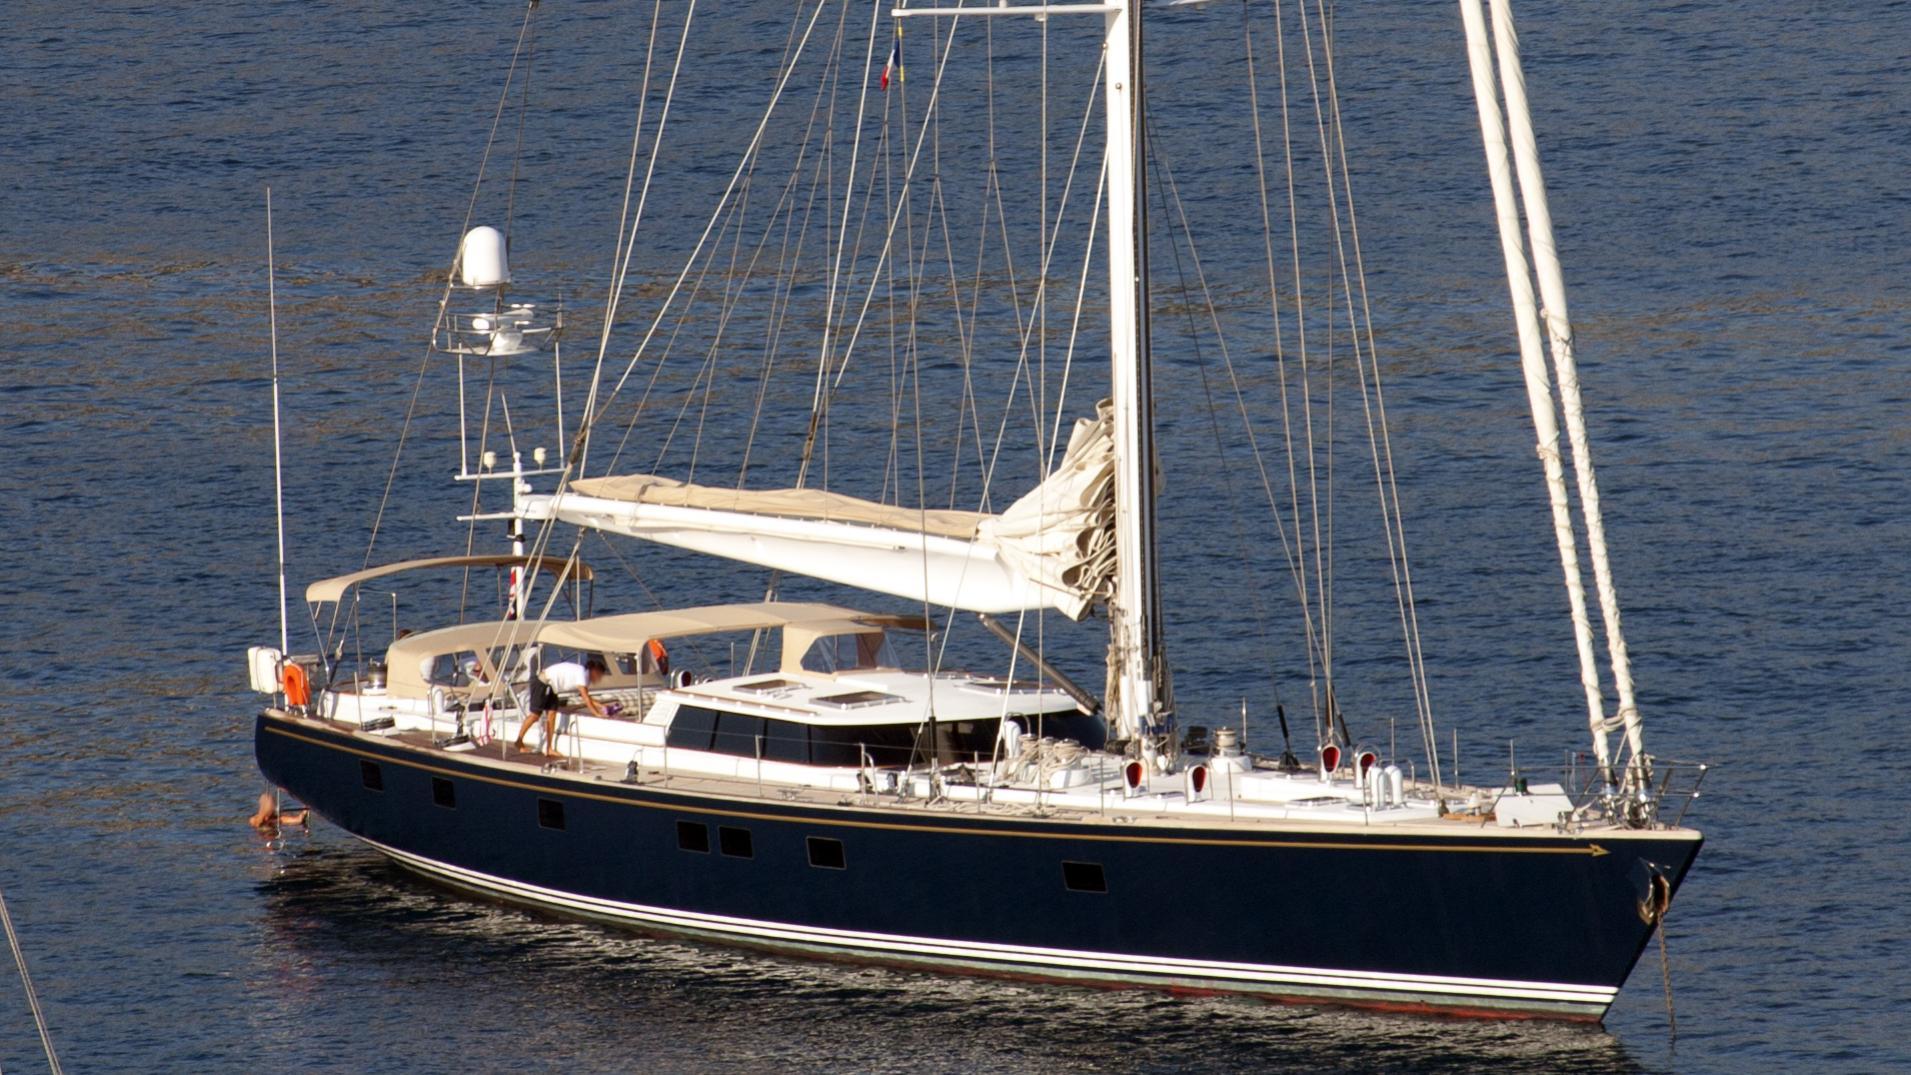 cinderella-ii-yacht-exterior